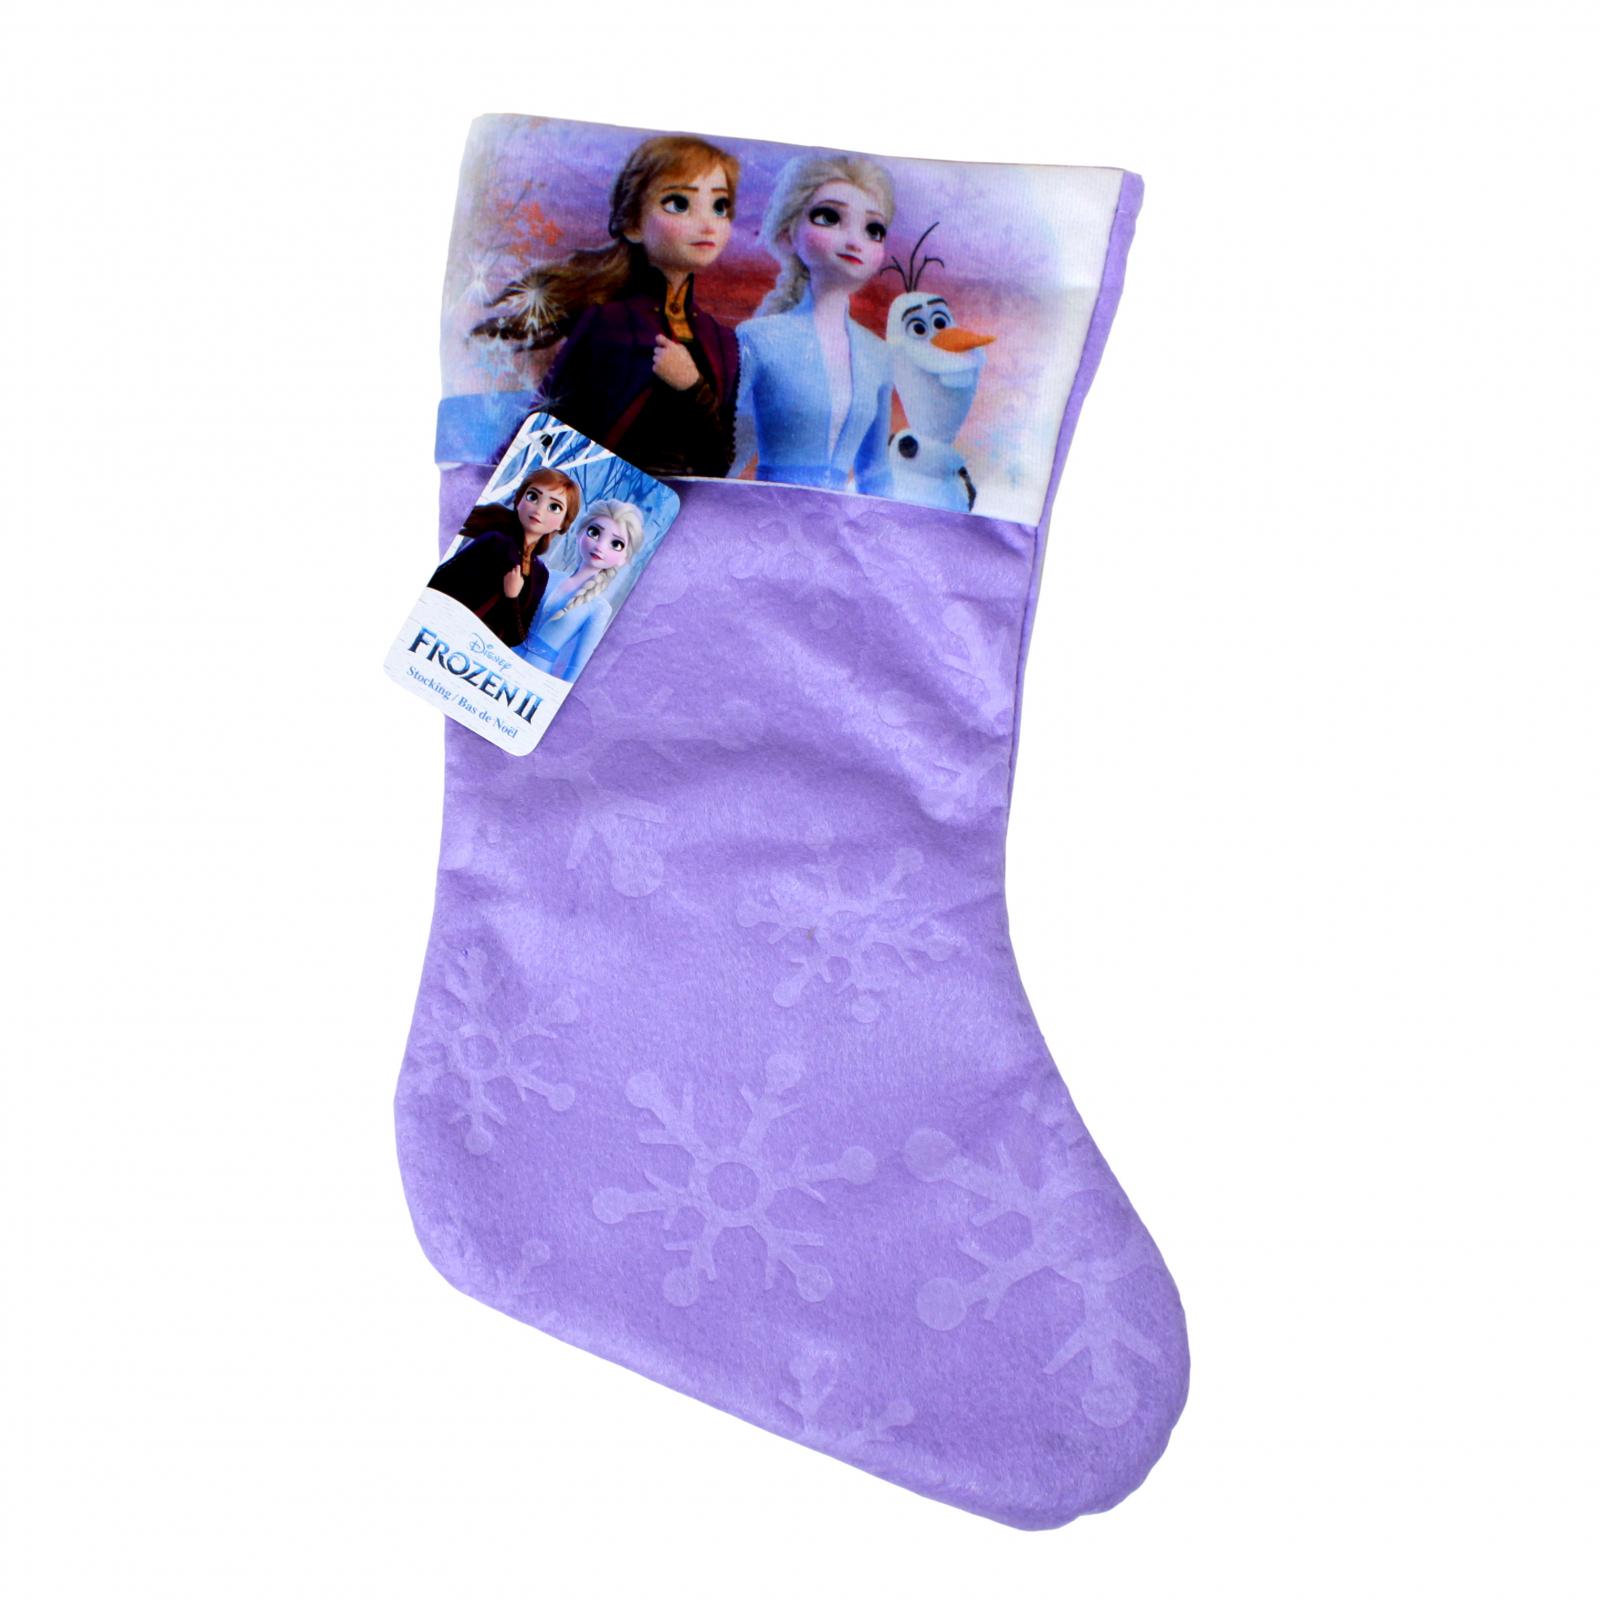 Disney Frozen 2 Girls Christmas Stocking Home Decor 15.5 In